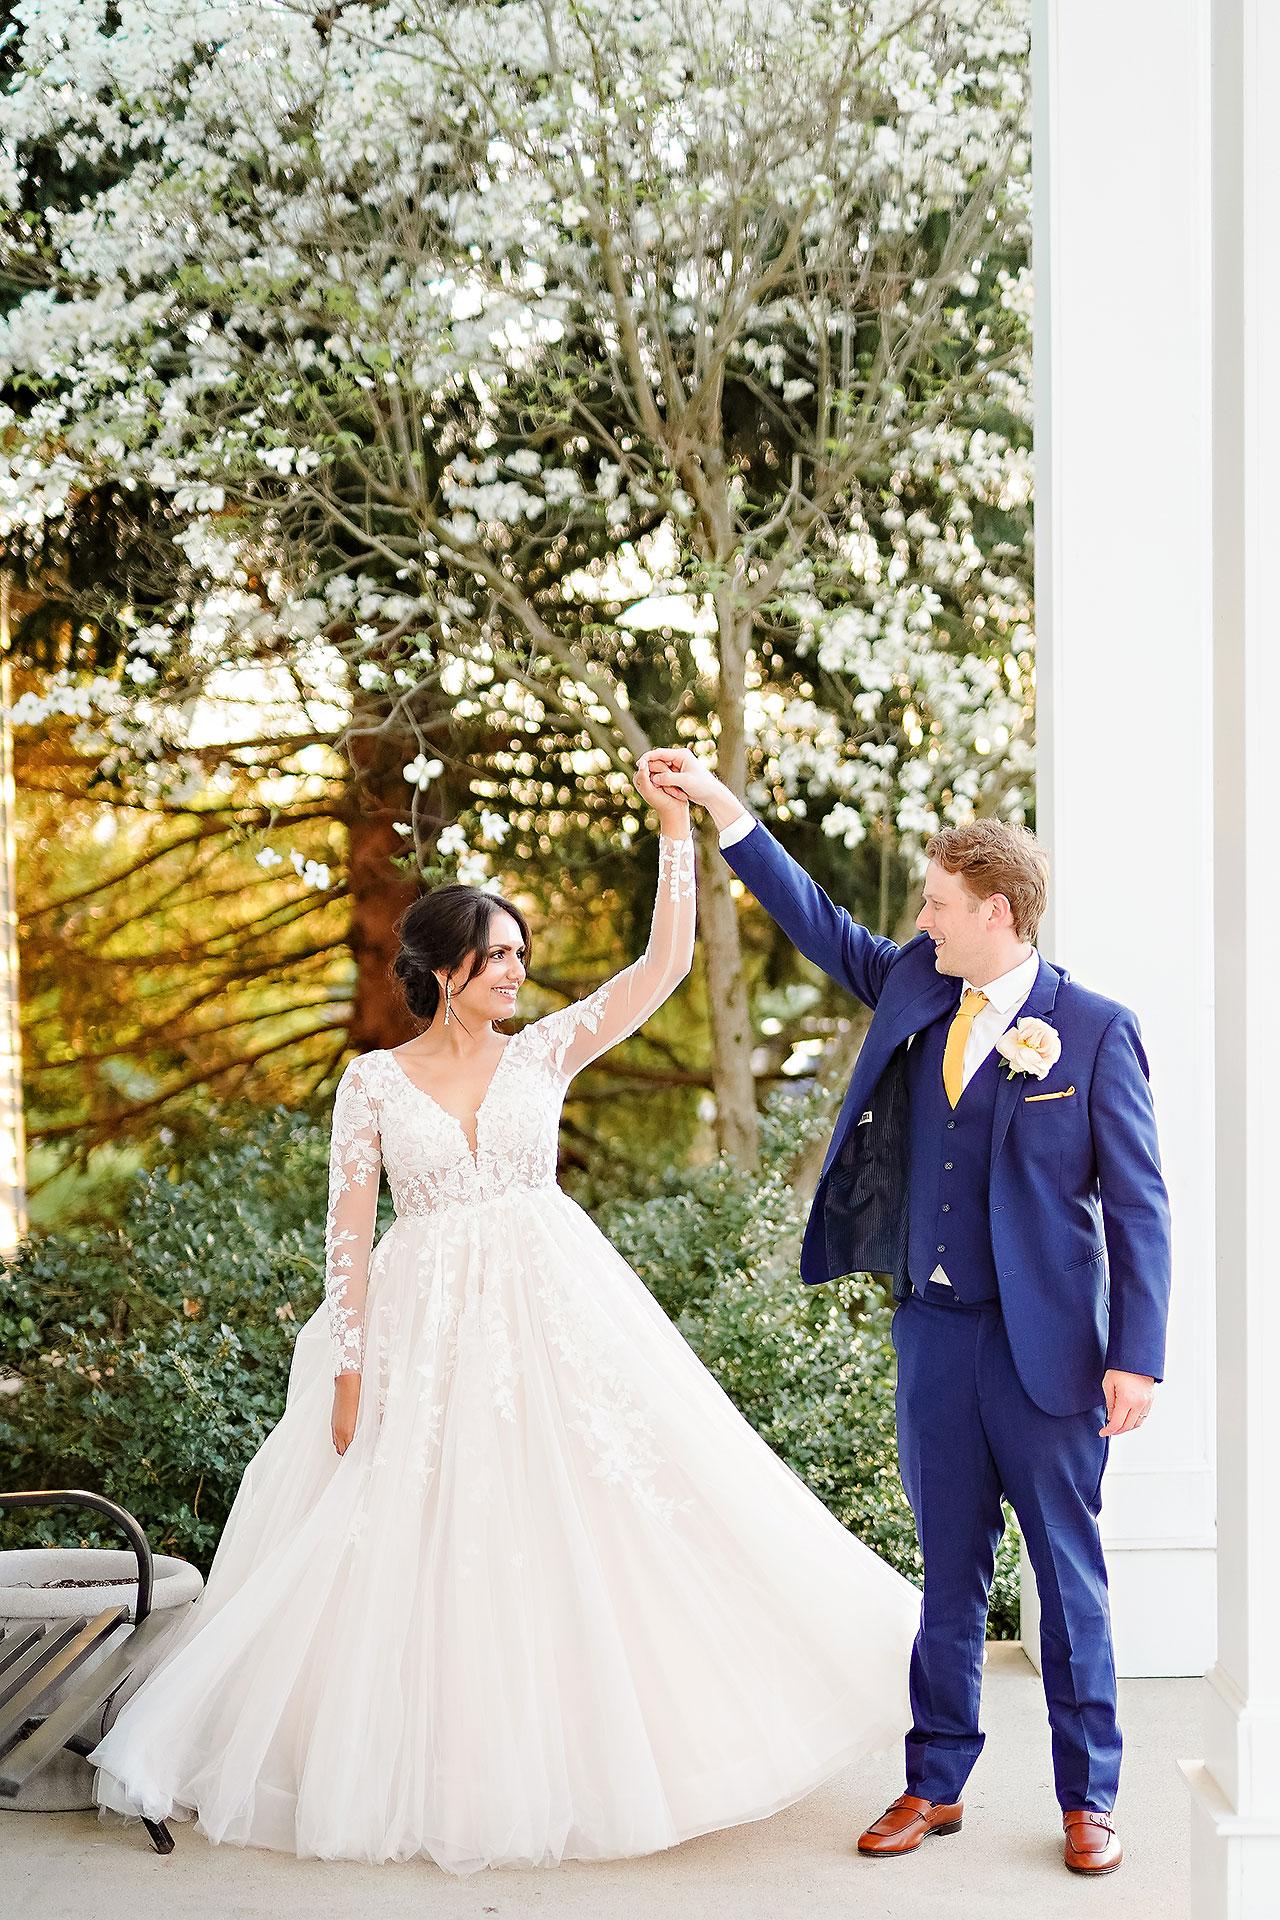 Nadia Parker Black Iris Estate Carmel Indiana Wedding May 2021 258